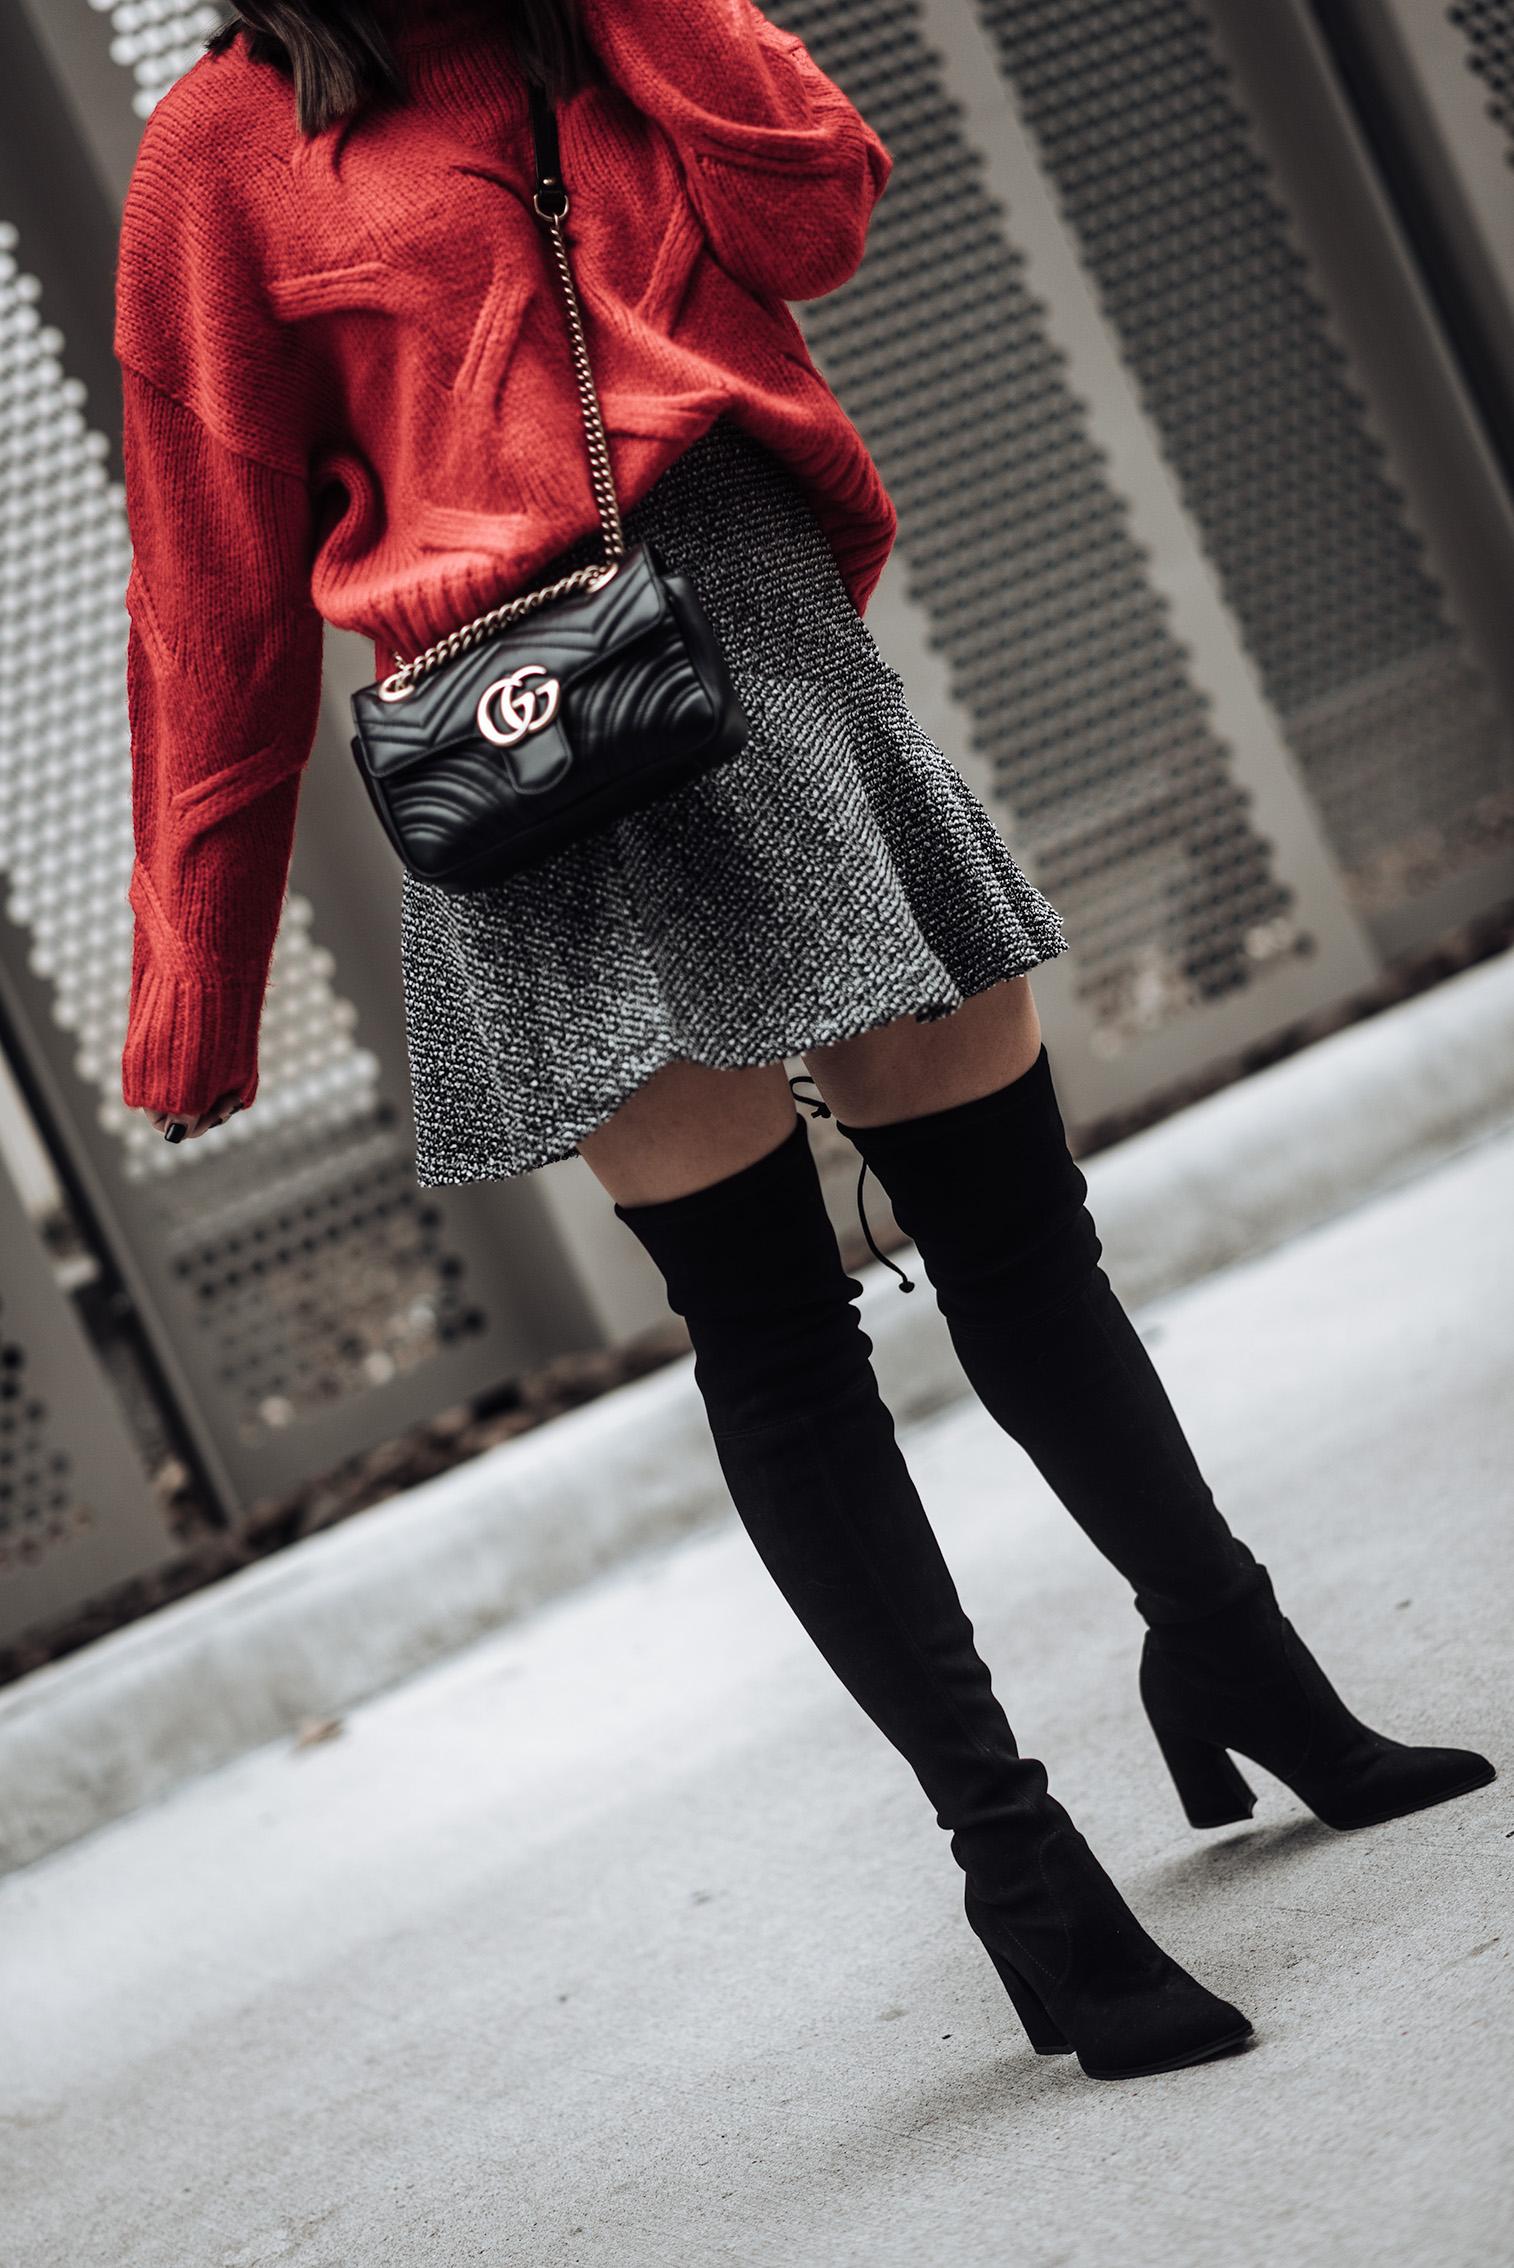 Tiffany Jais fashion and lifestyle blogger of Flaunt and Center | Houston fashion blogger | After Christmas sales | Streetstyle blog | Stuart Weitzman boots